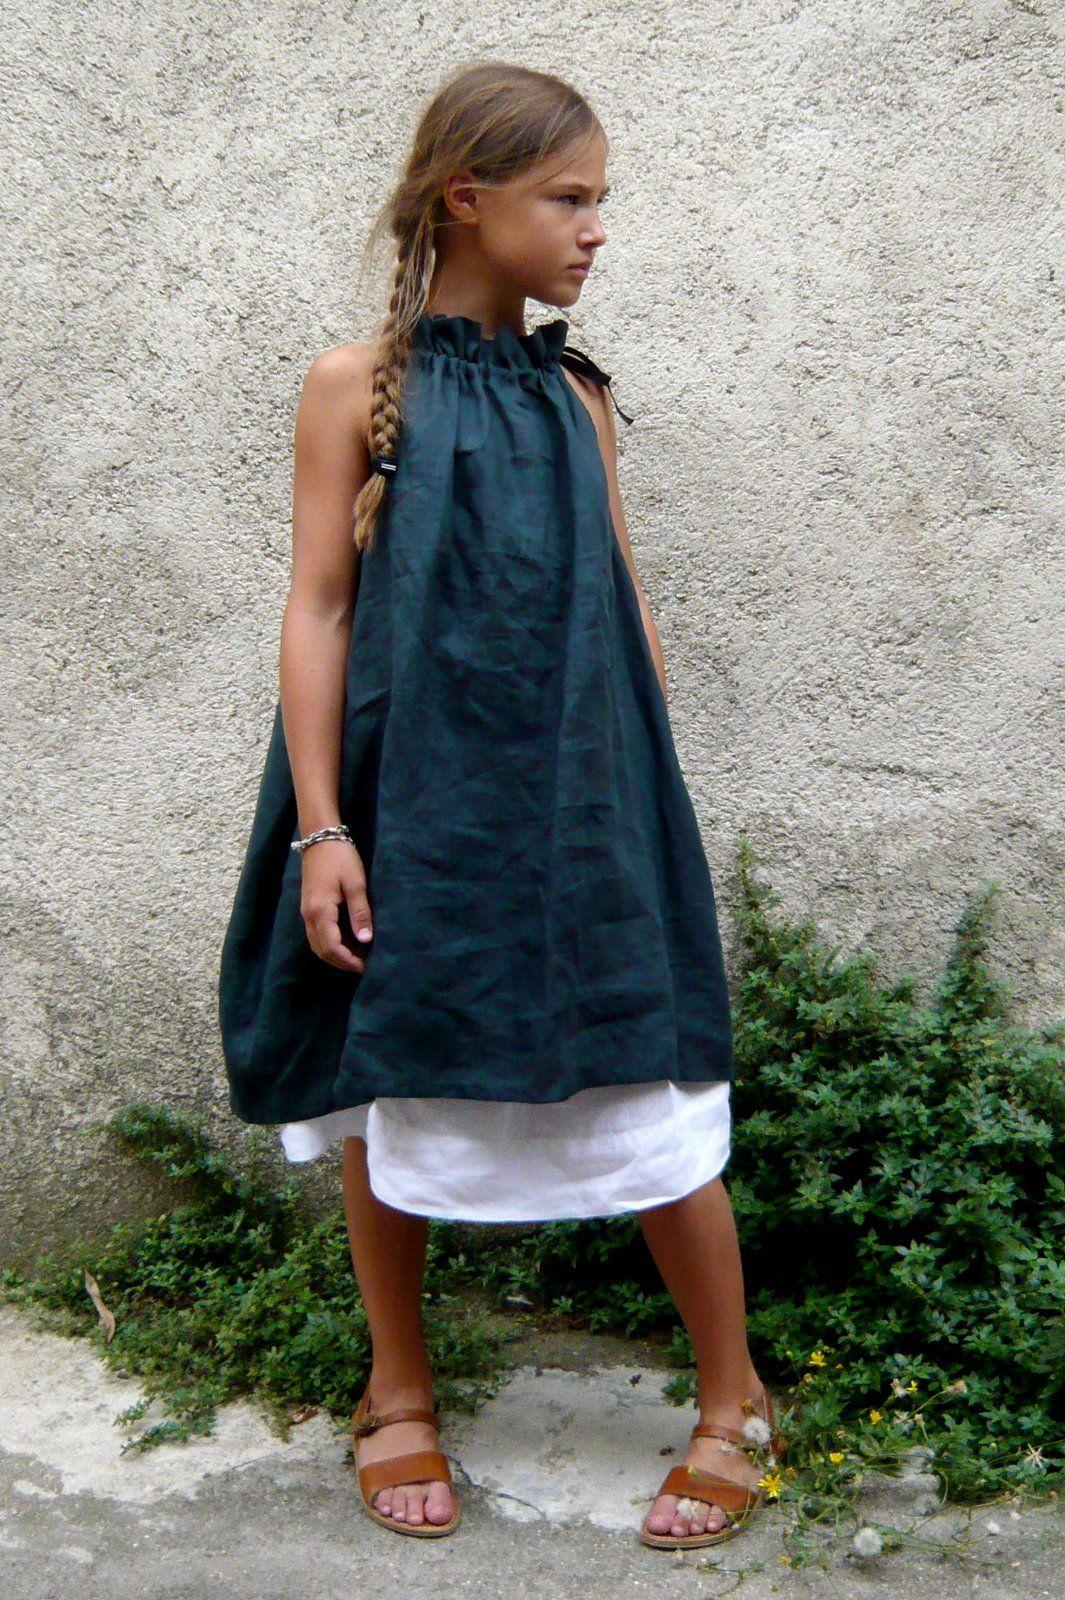 Pin by lian torres de leon on muñeca pinterest girl blog blog